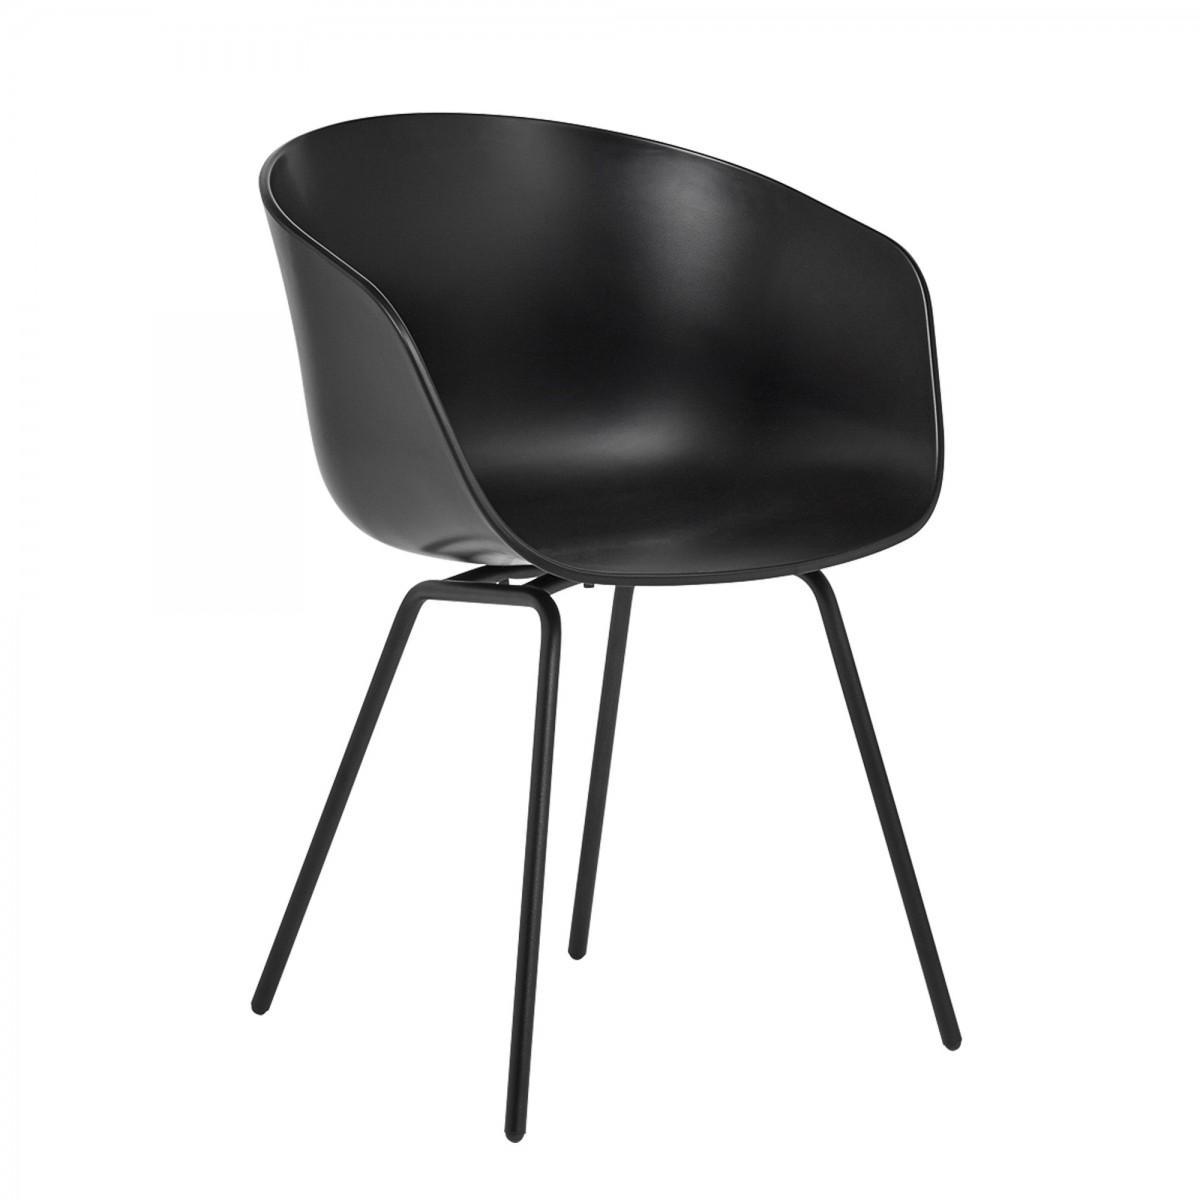 aac 26 black chair hay. Black Bedroom Furniture Sets. Home Design Ideas